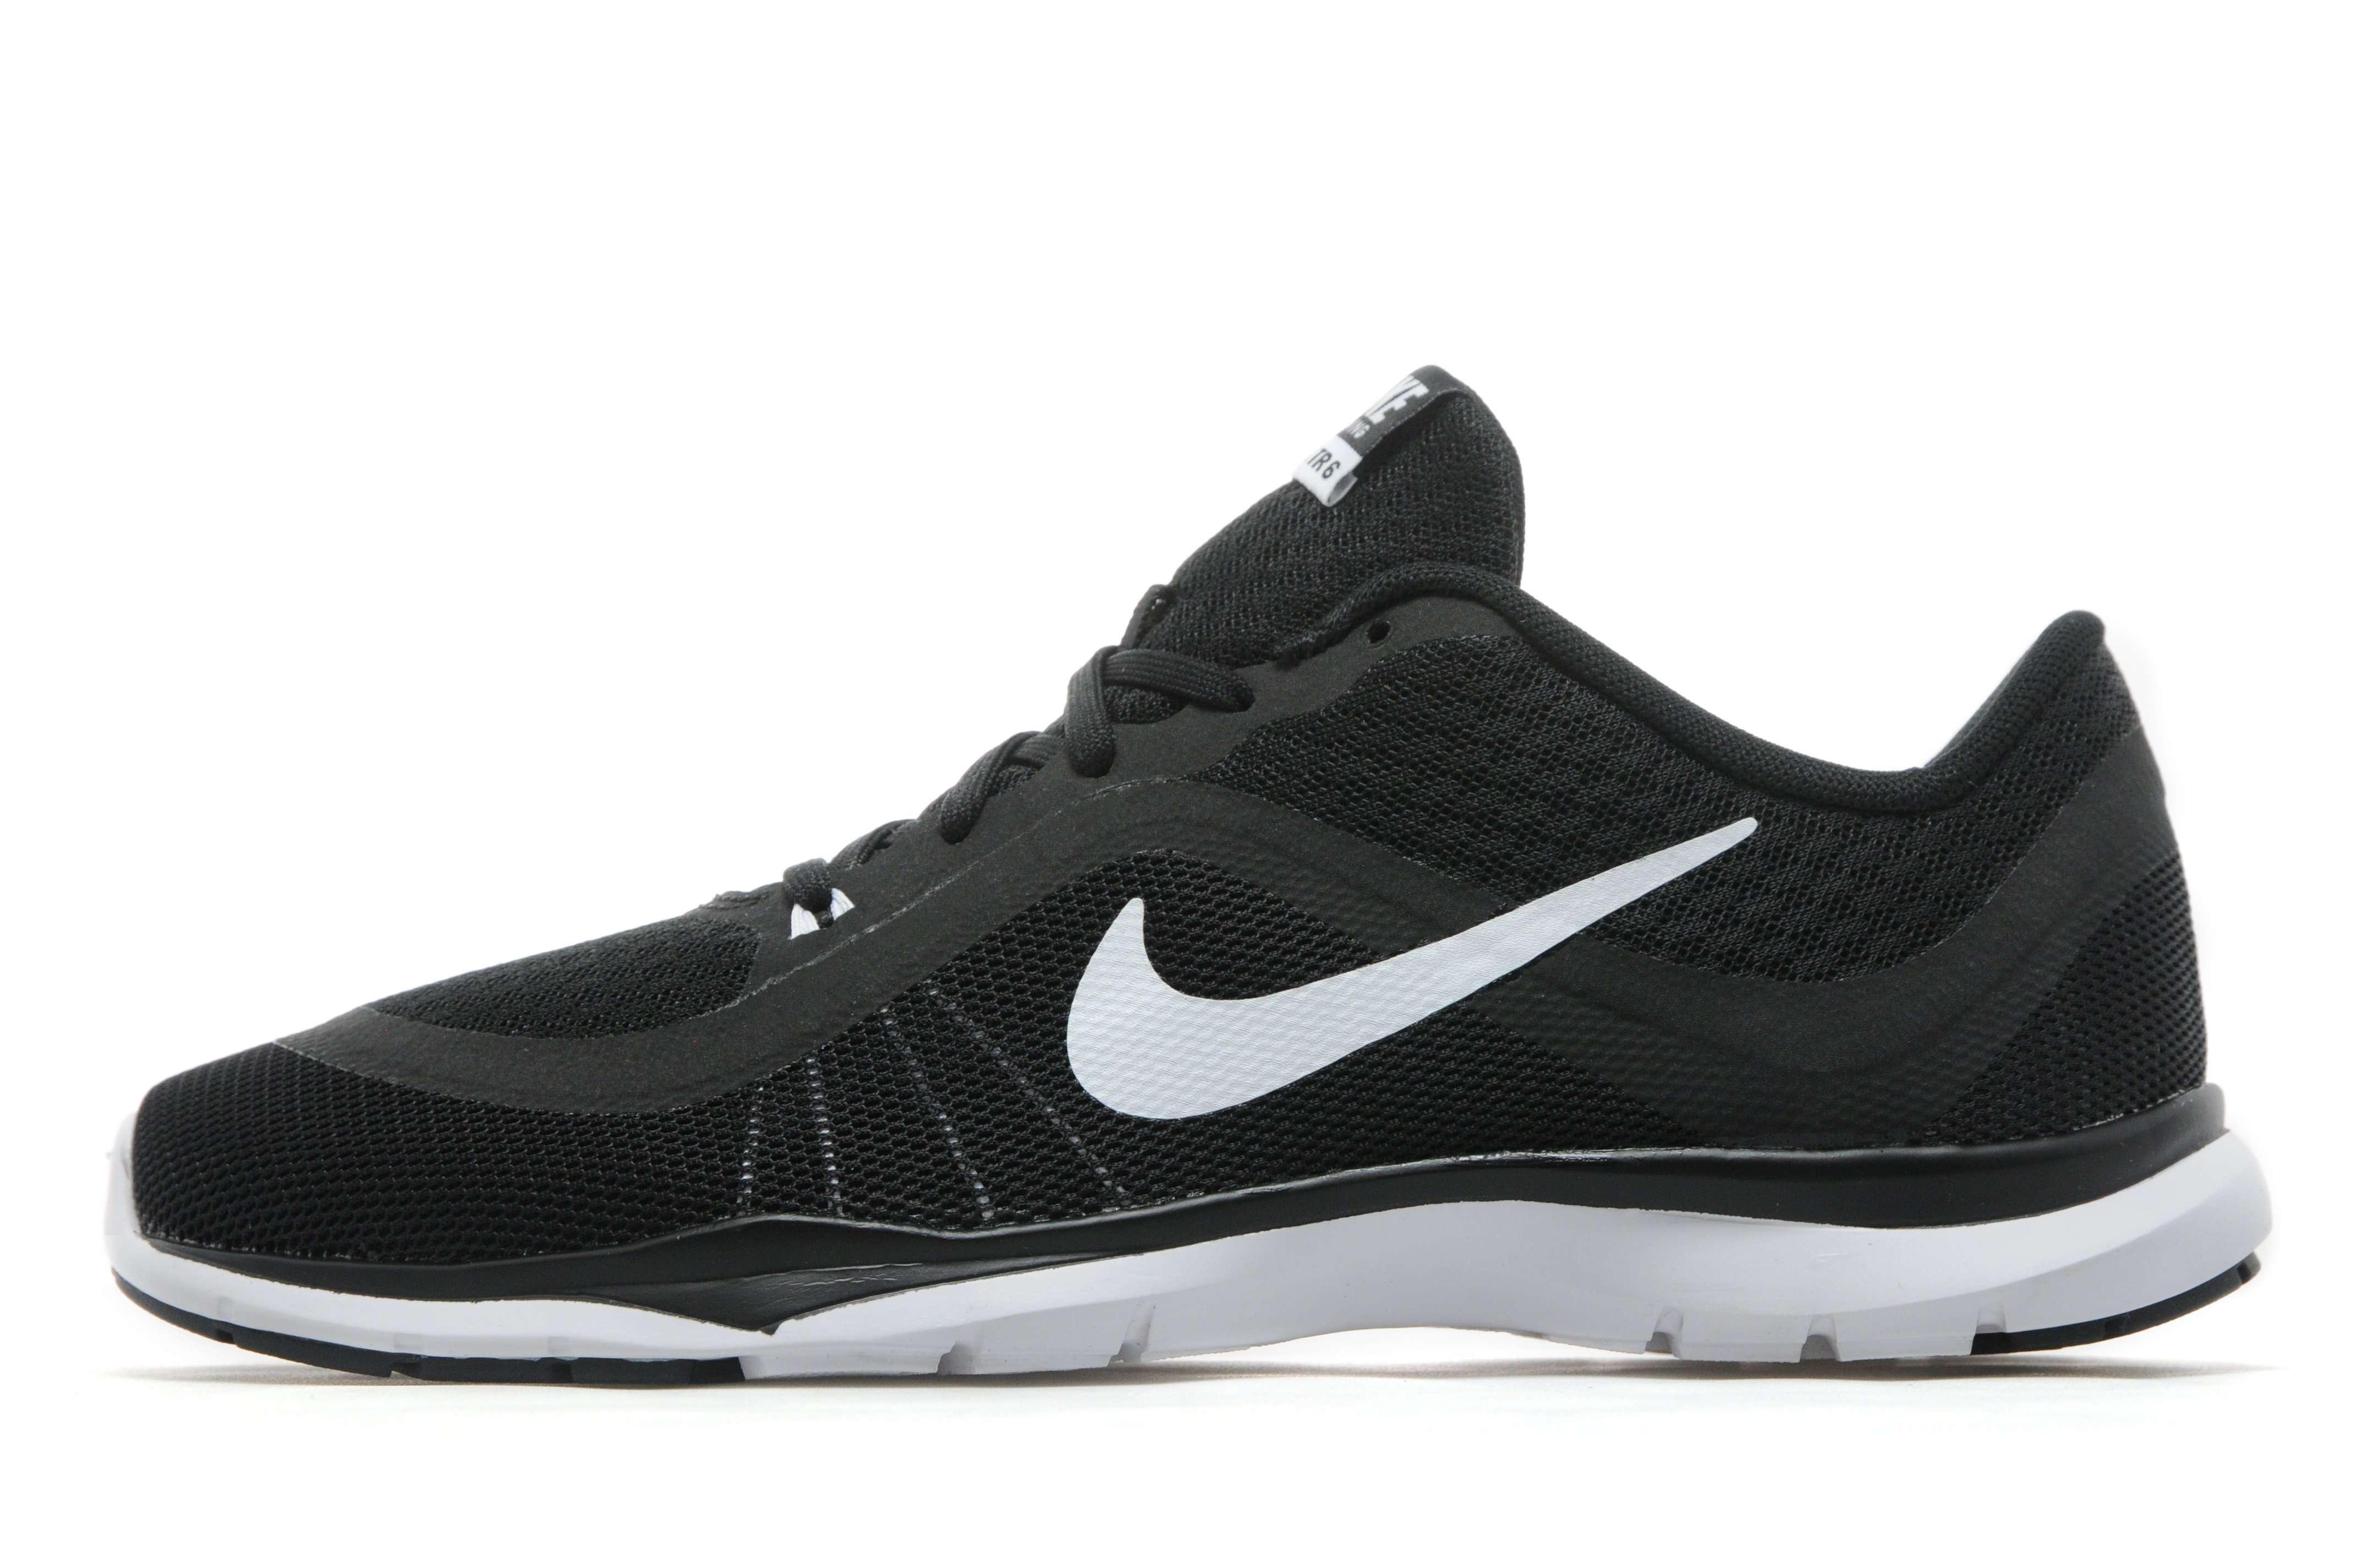 Nike roshe run men camo